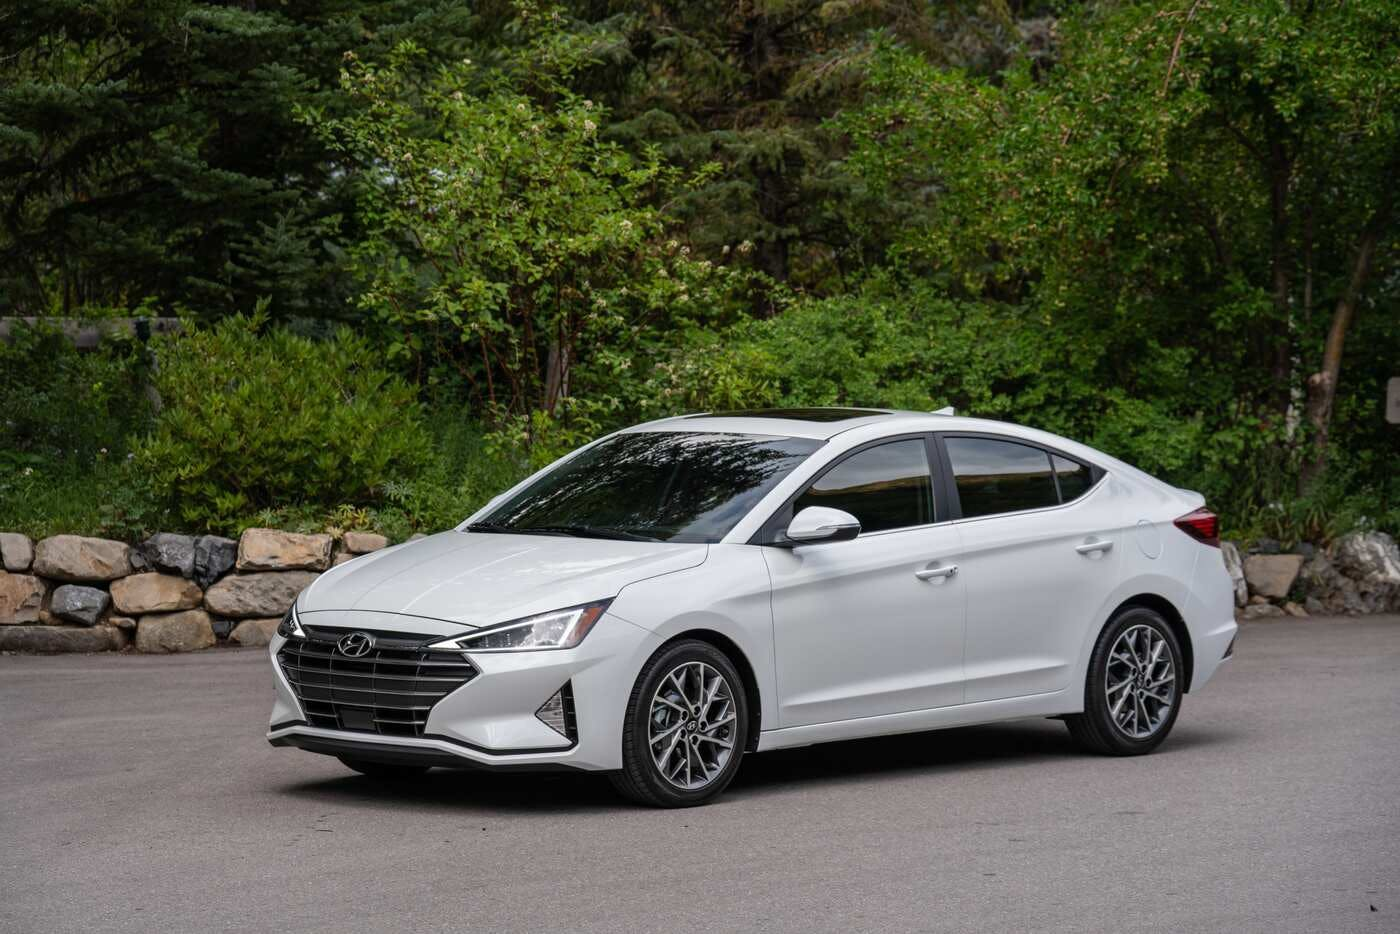 2020 Hyundai Elantra Research New